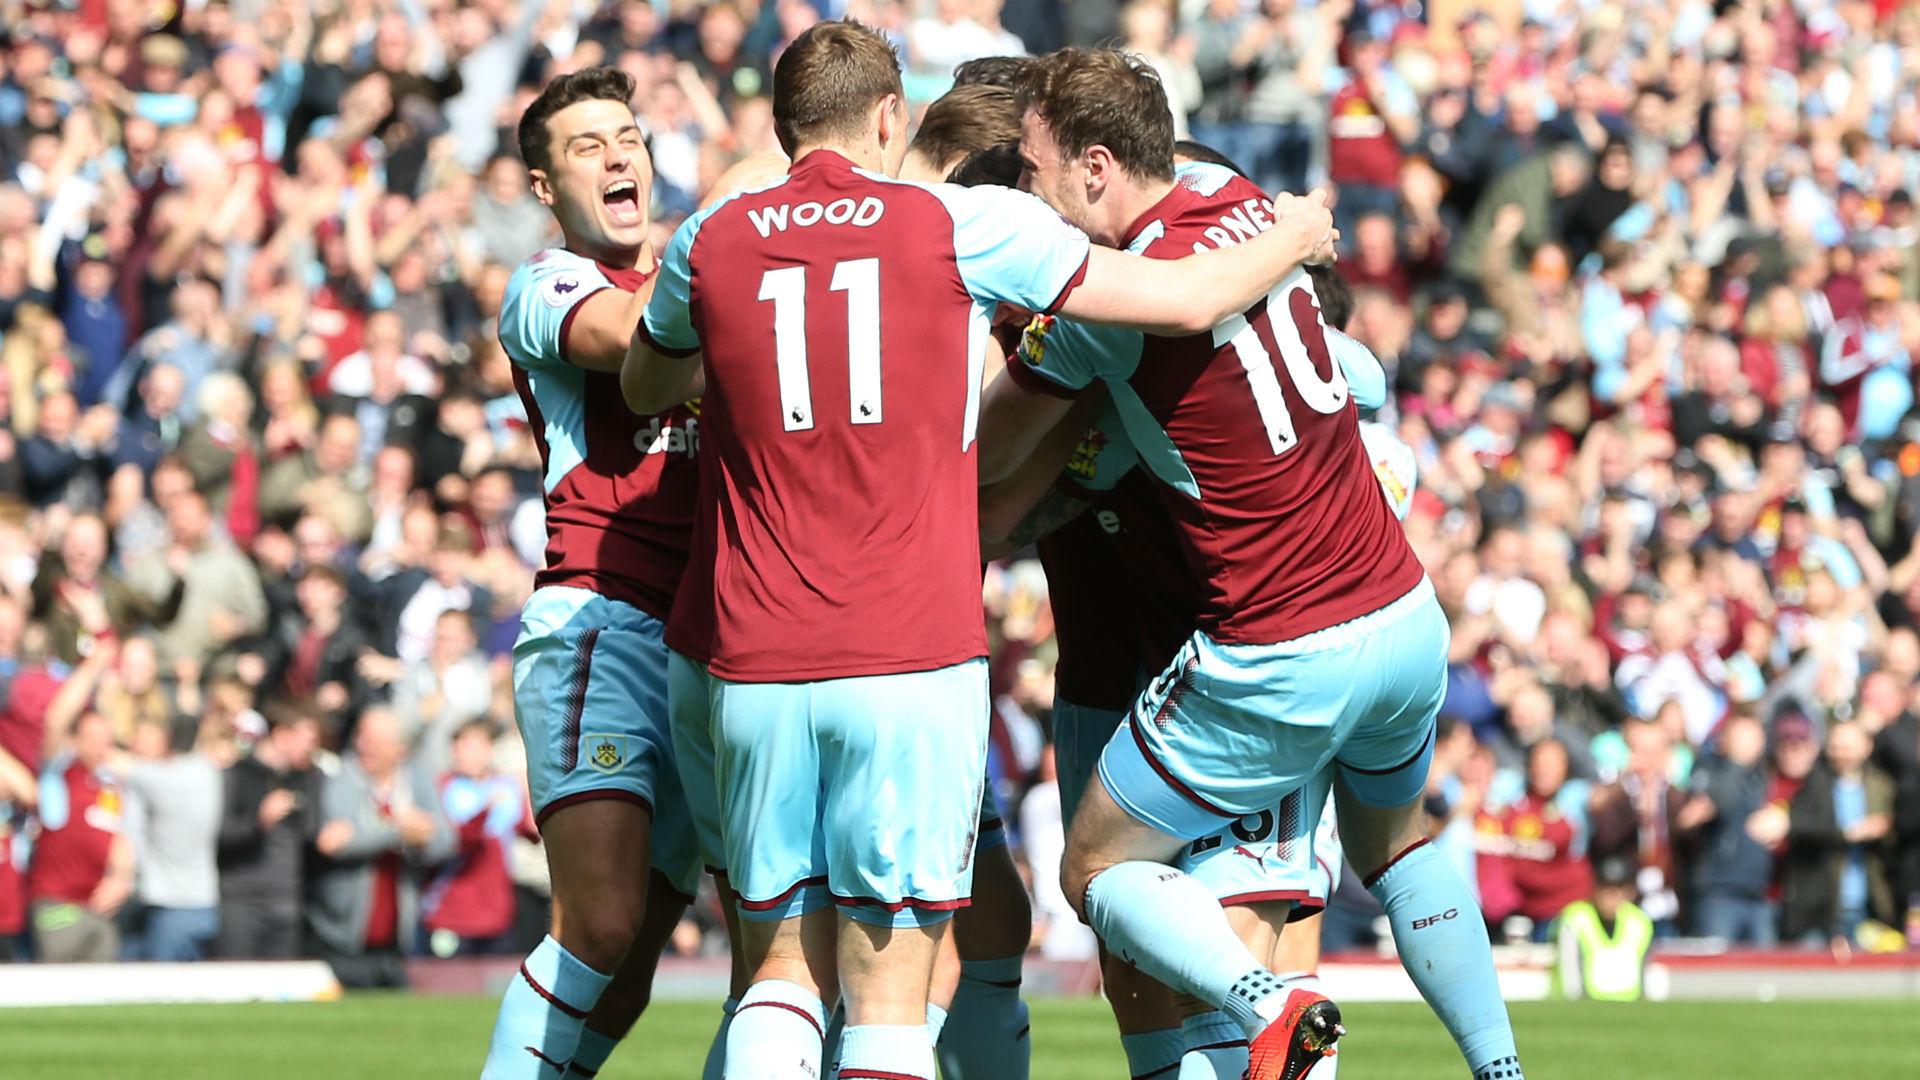 Premier League updates from Turf Moor